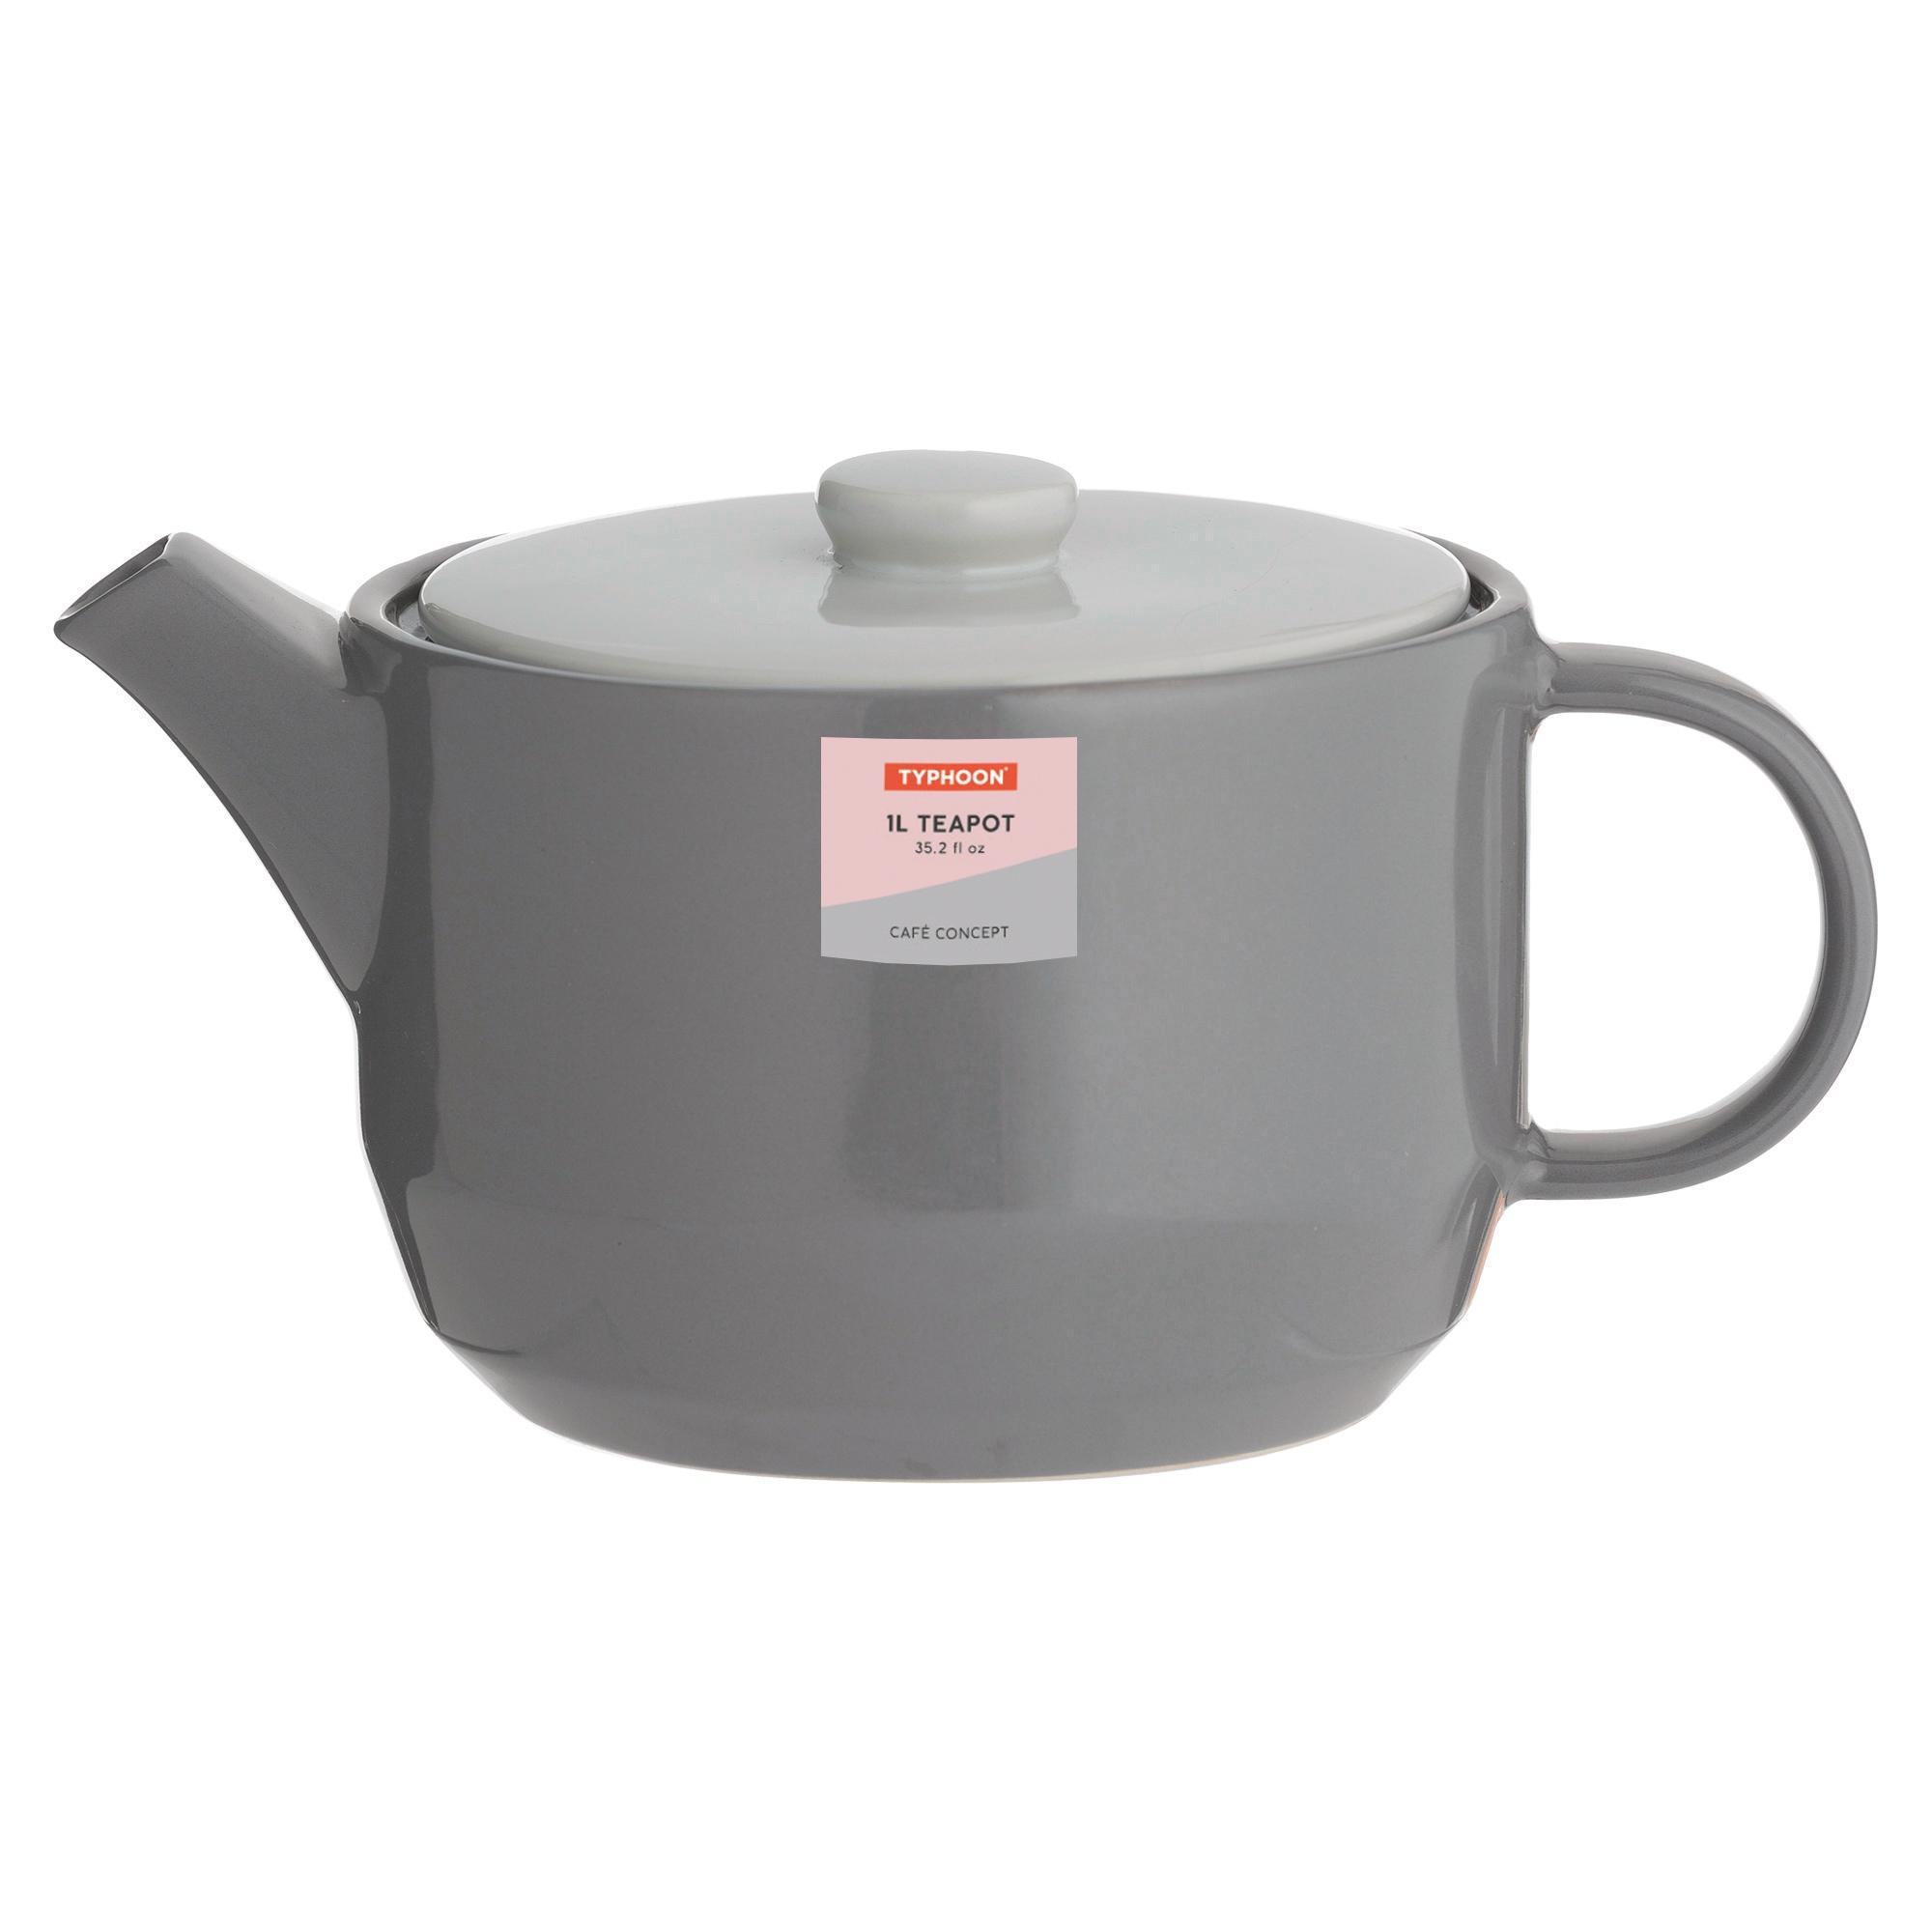 Typhoon Cafe Concept Teapot Dark Grey 1L